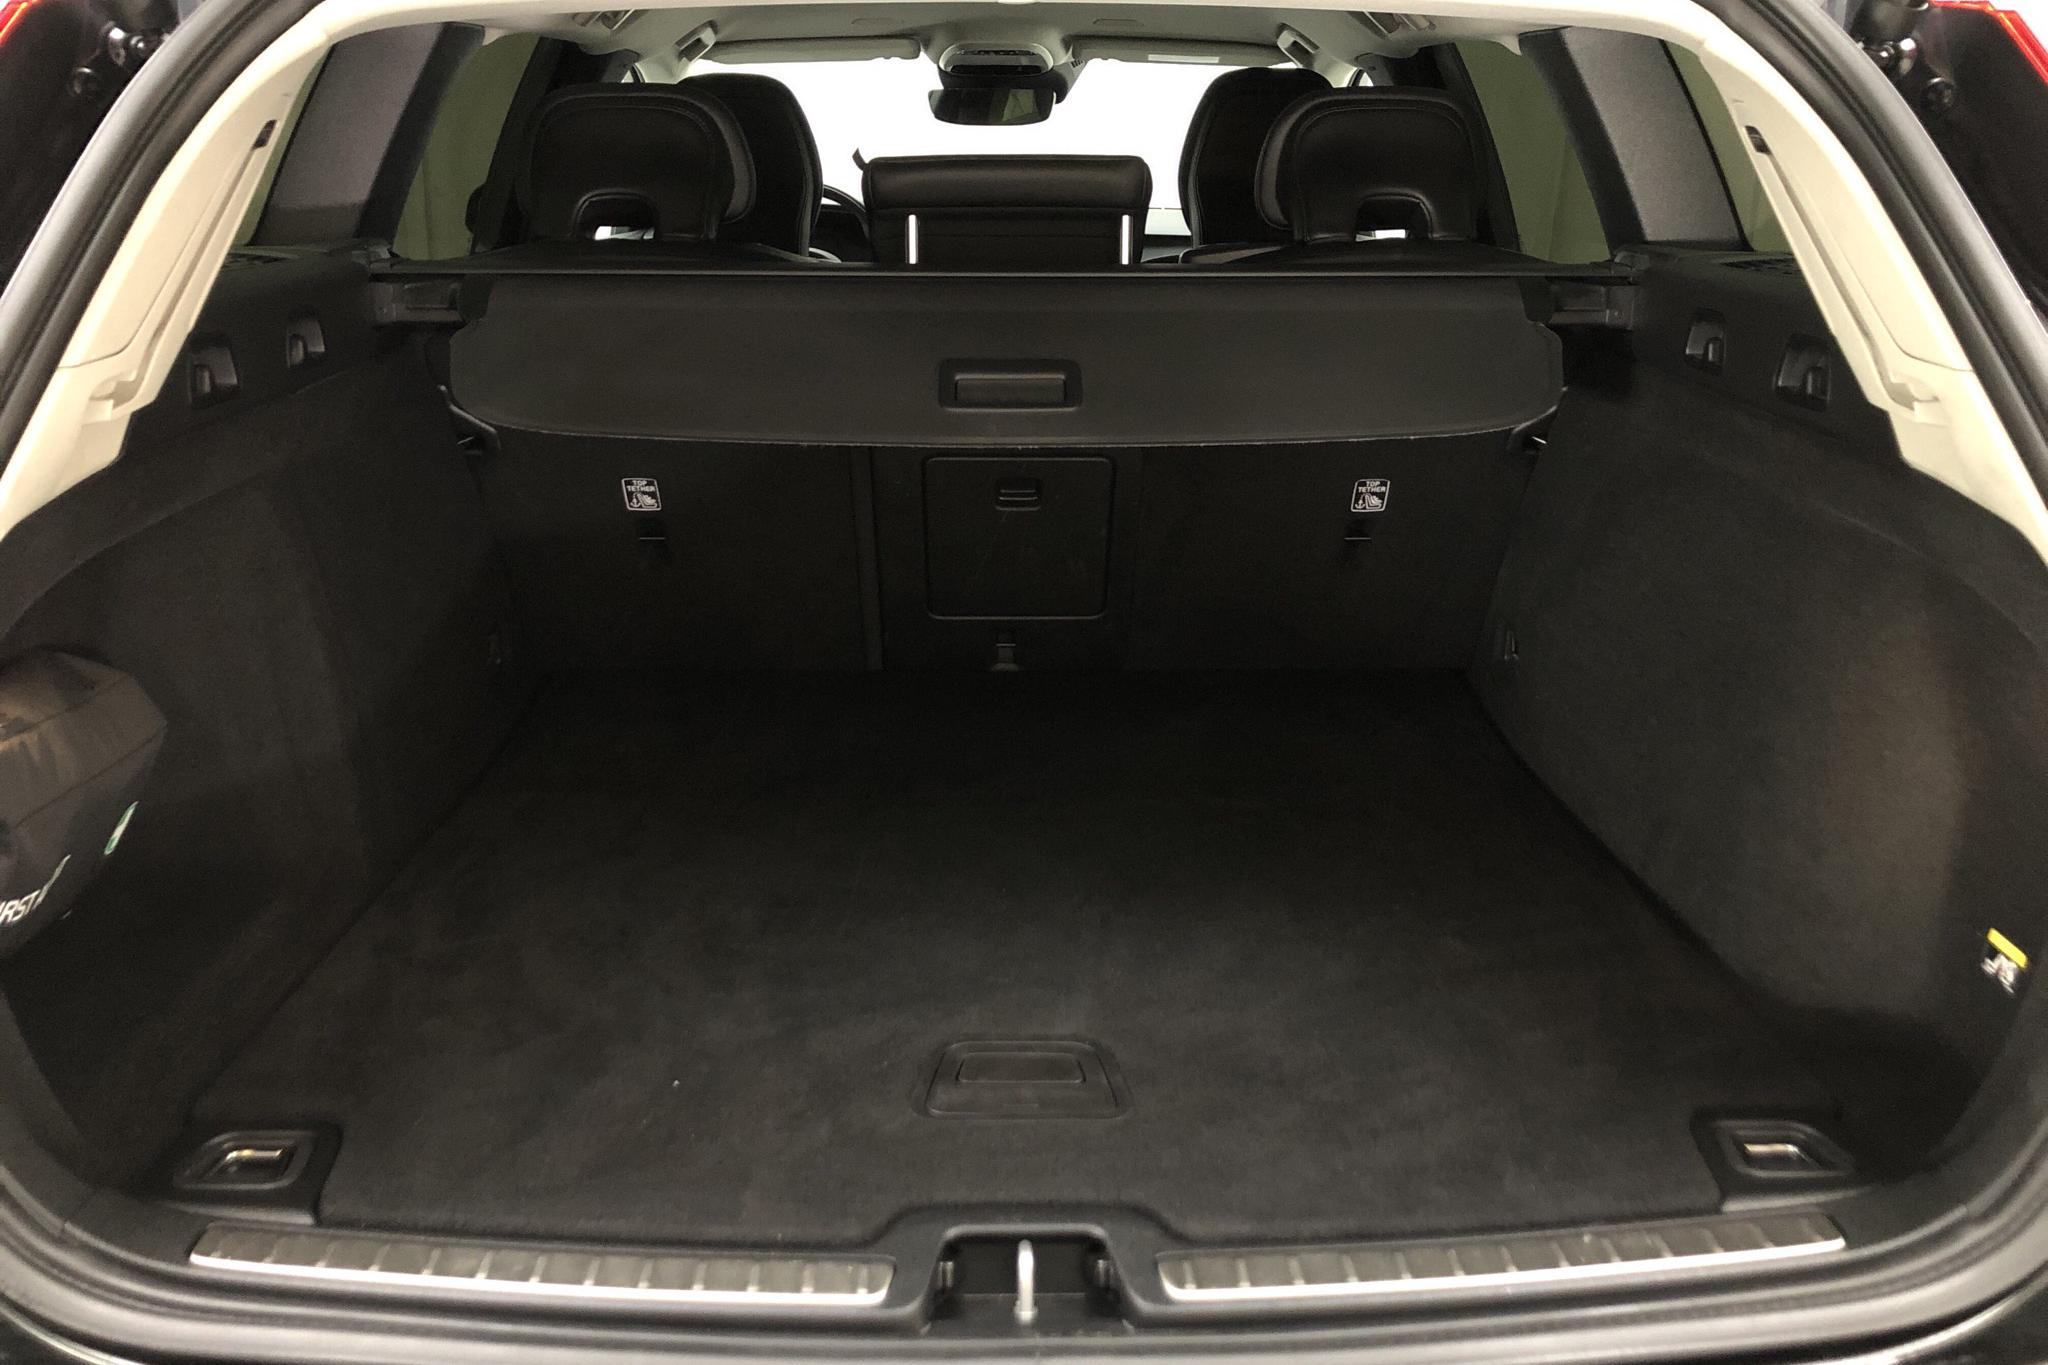 Volvo V60 D4 Cross Country AWD (190hk) - 10 102 mil - Automat - svart - 2019